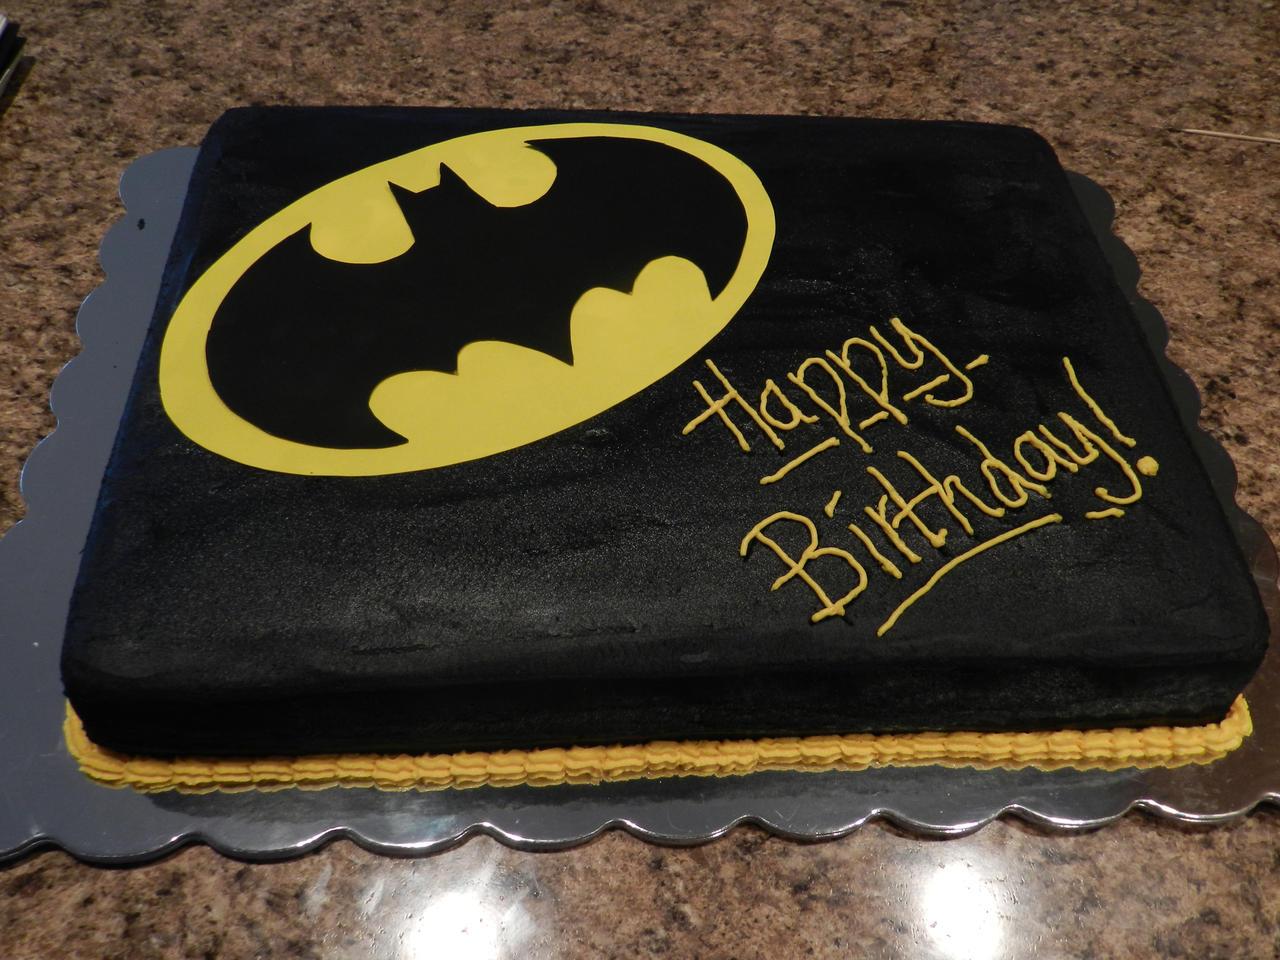 Where Can I Buy A Batman Cake